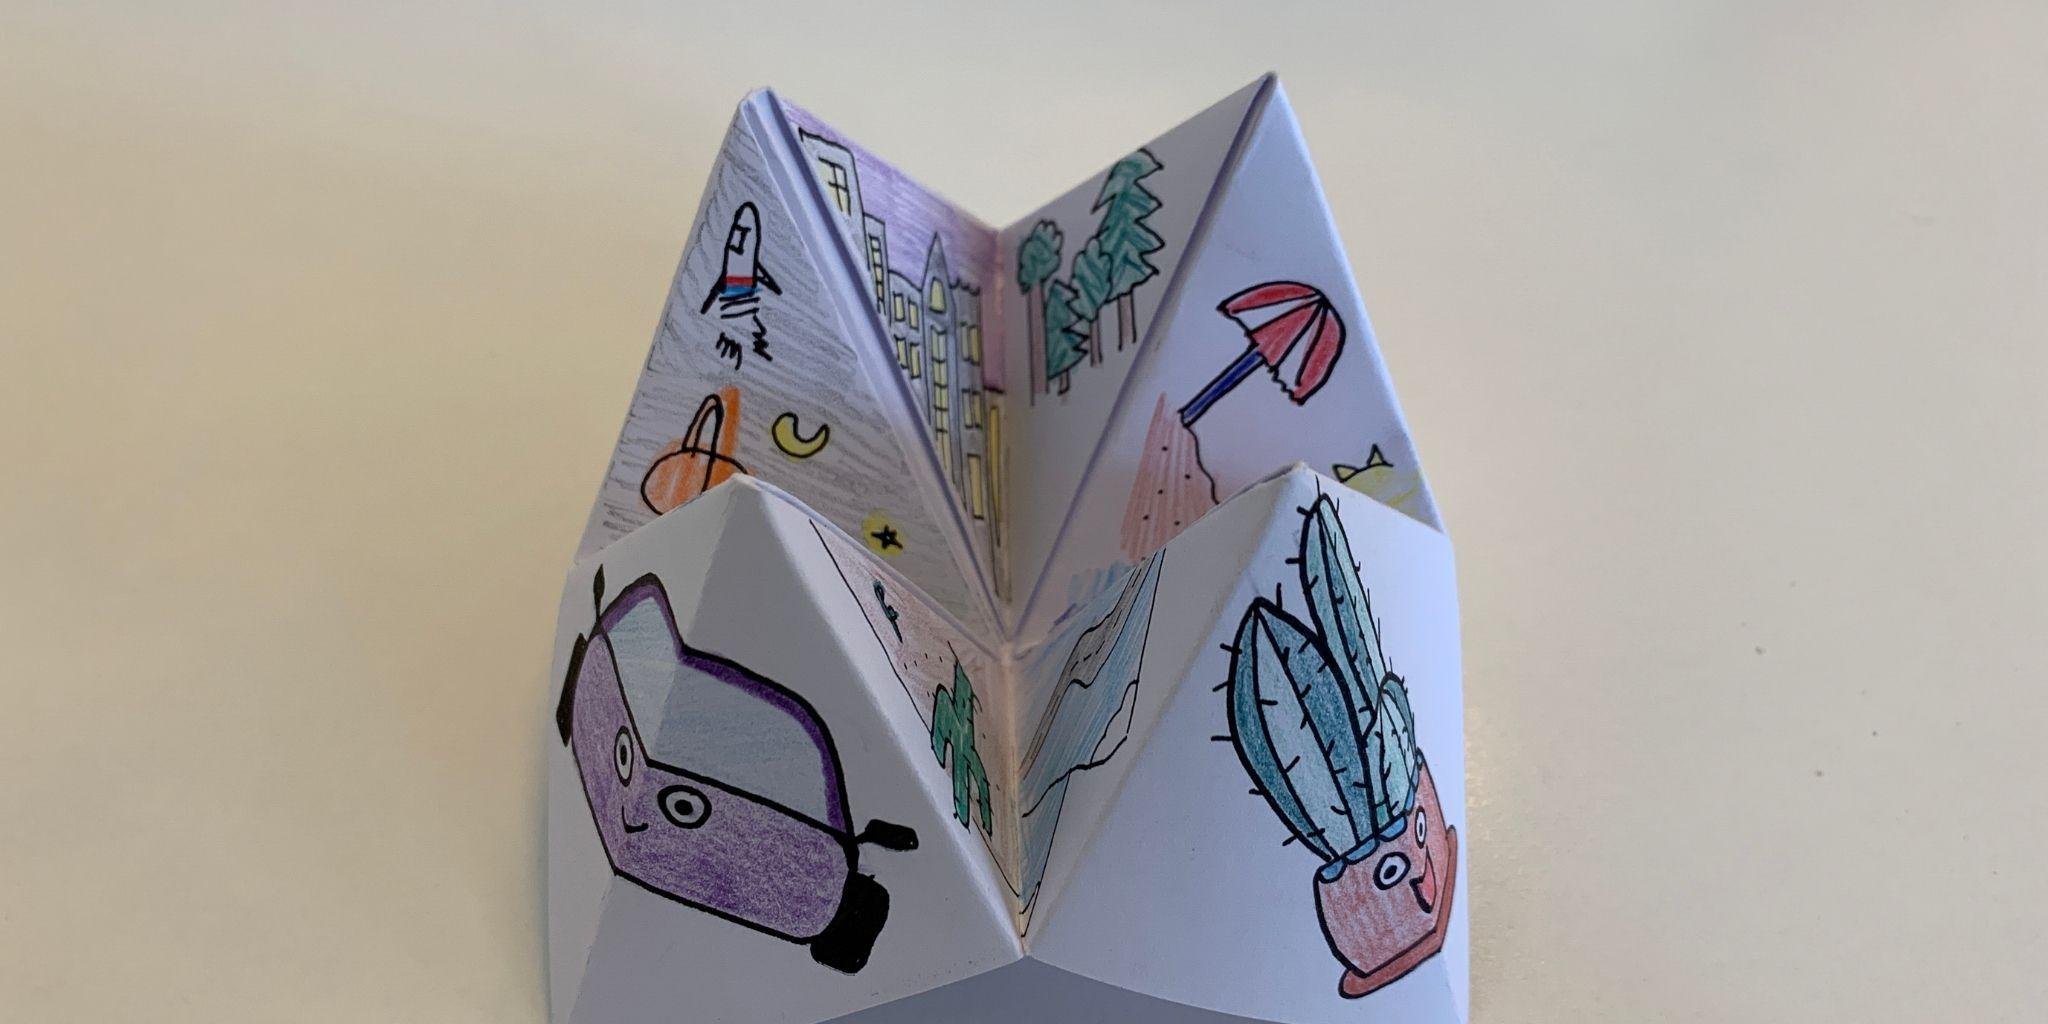 Origami verhalenverteller